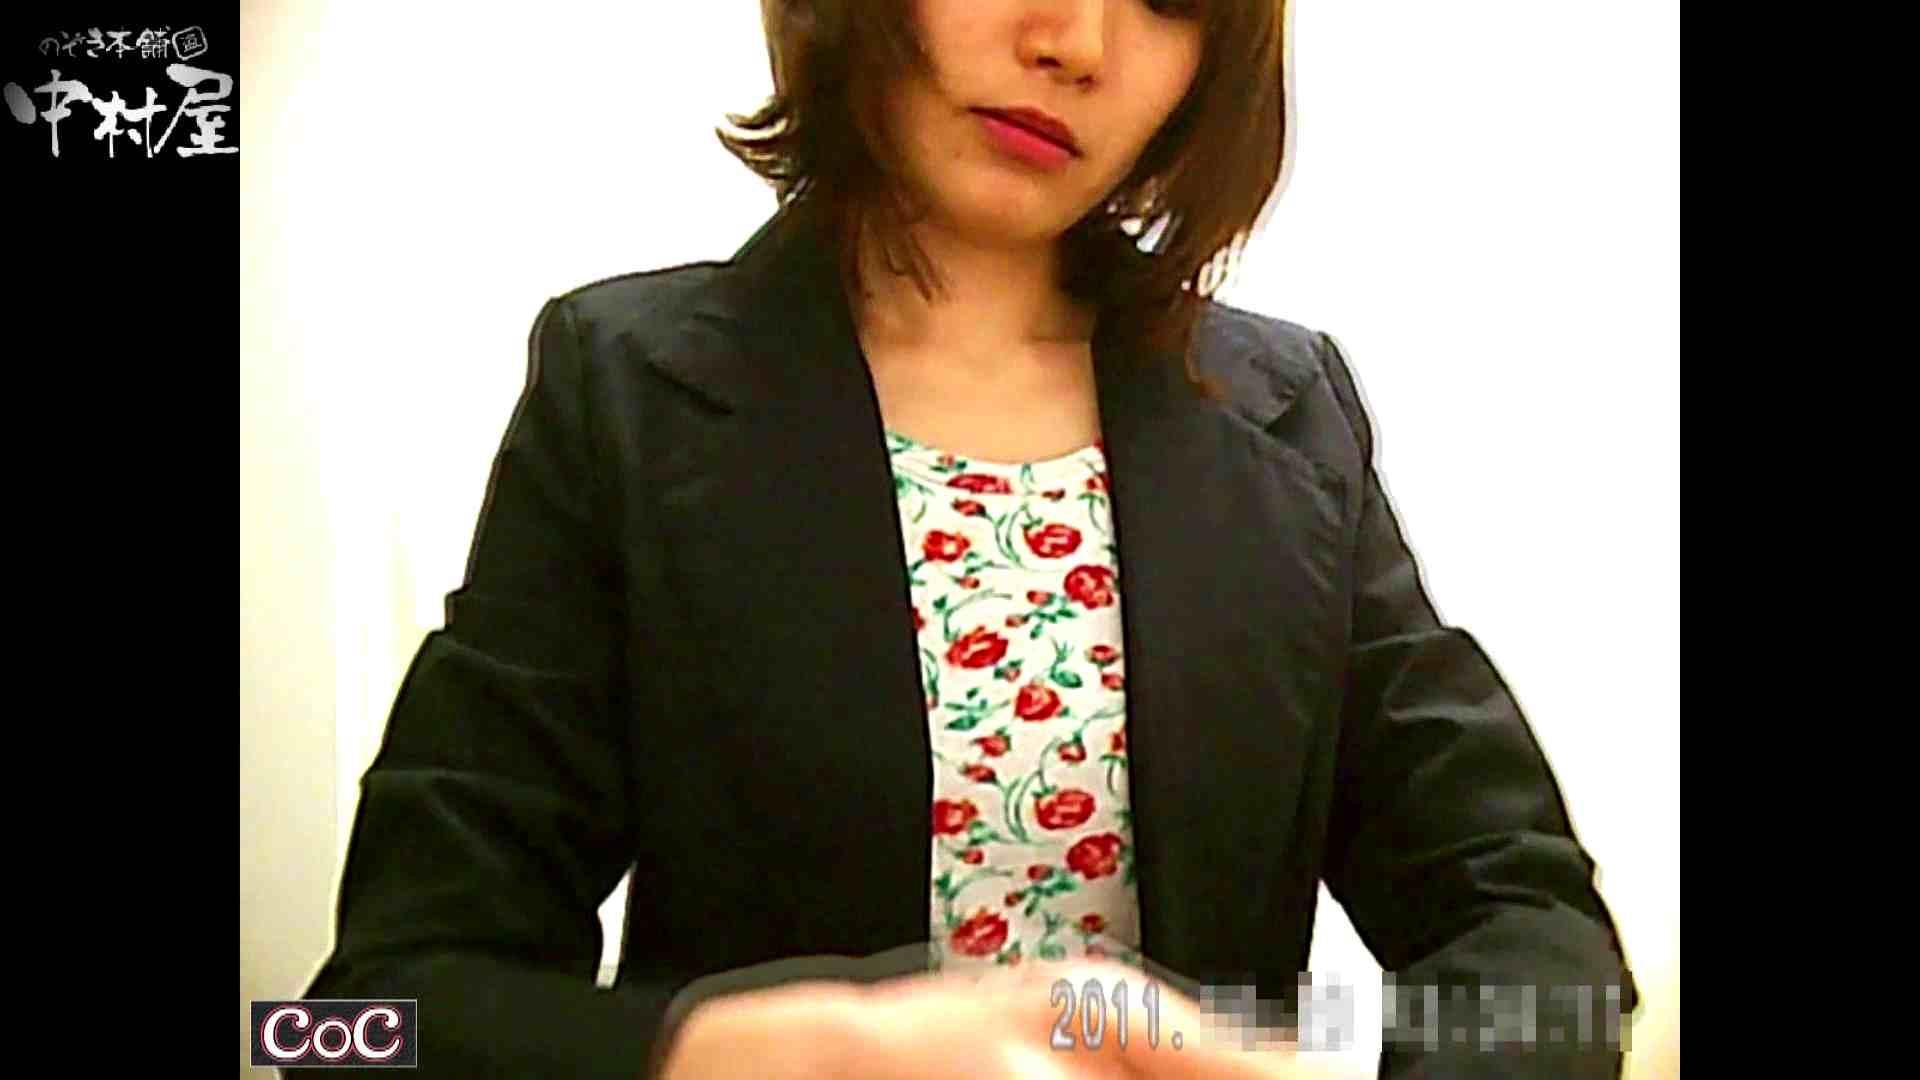 Doctor-X元医者による反抗vol.63 OLハメ撮り  61Pix 1